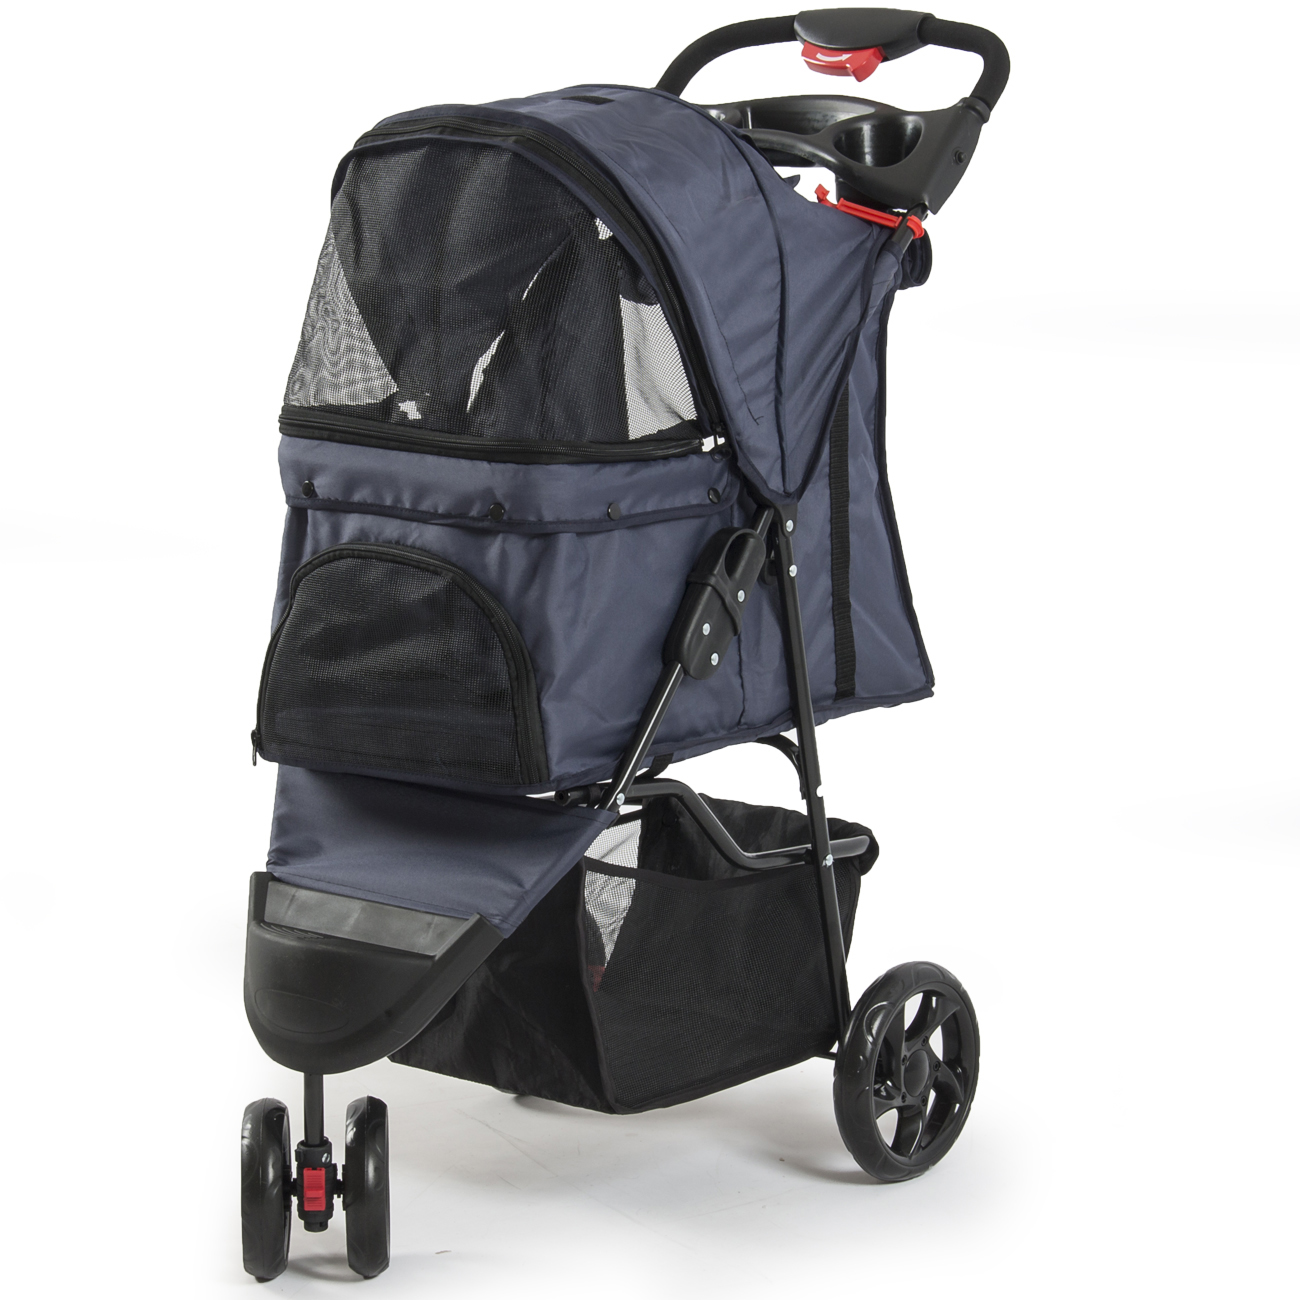 3 Wheel Pet Stroller Dog Easy Portable Fold Able Carrier W